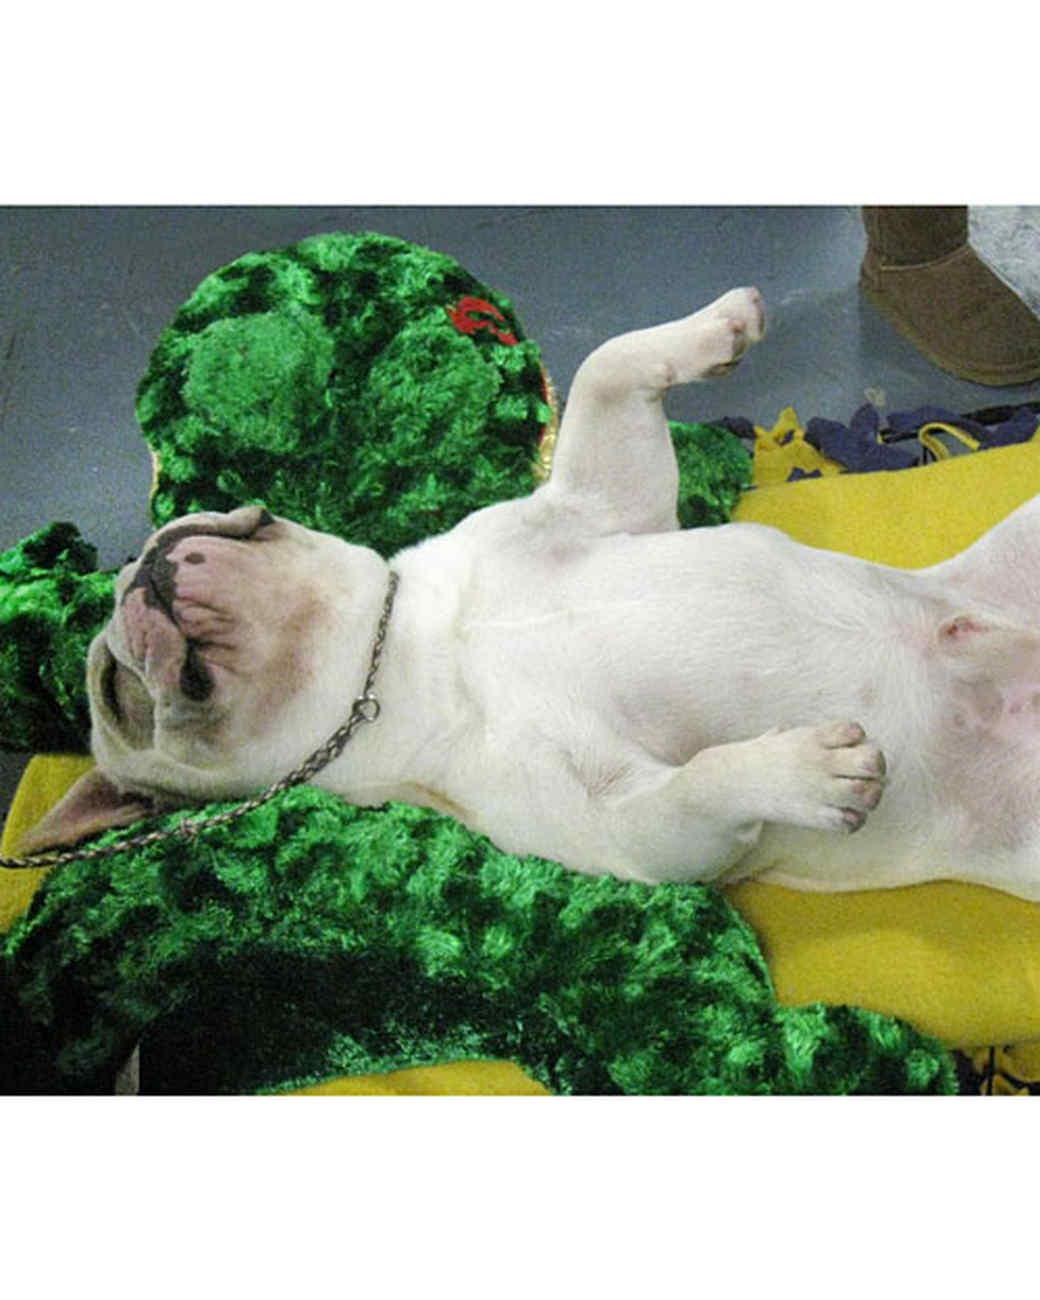 6104_021611_french_bulldog_exhausted.jpg